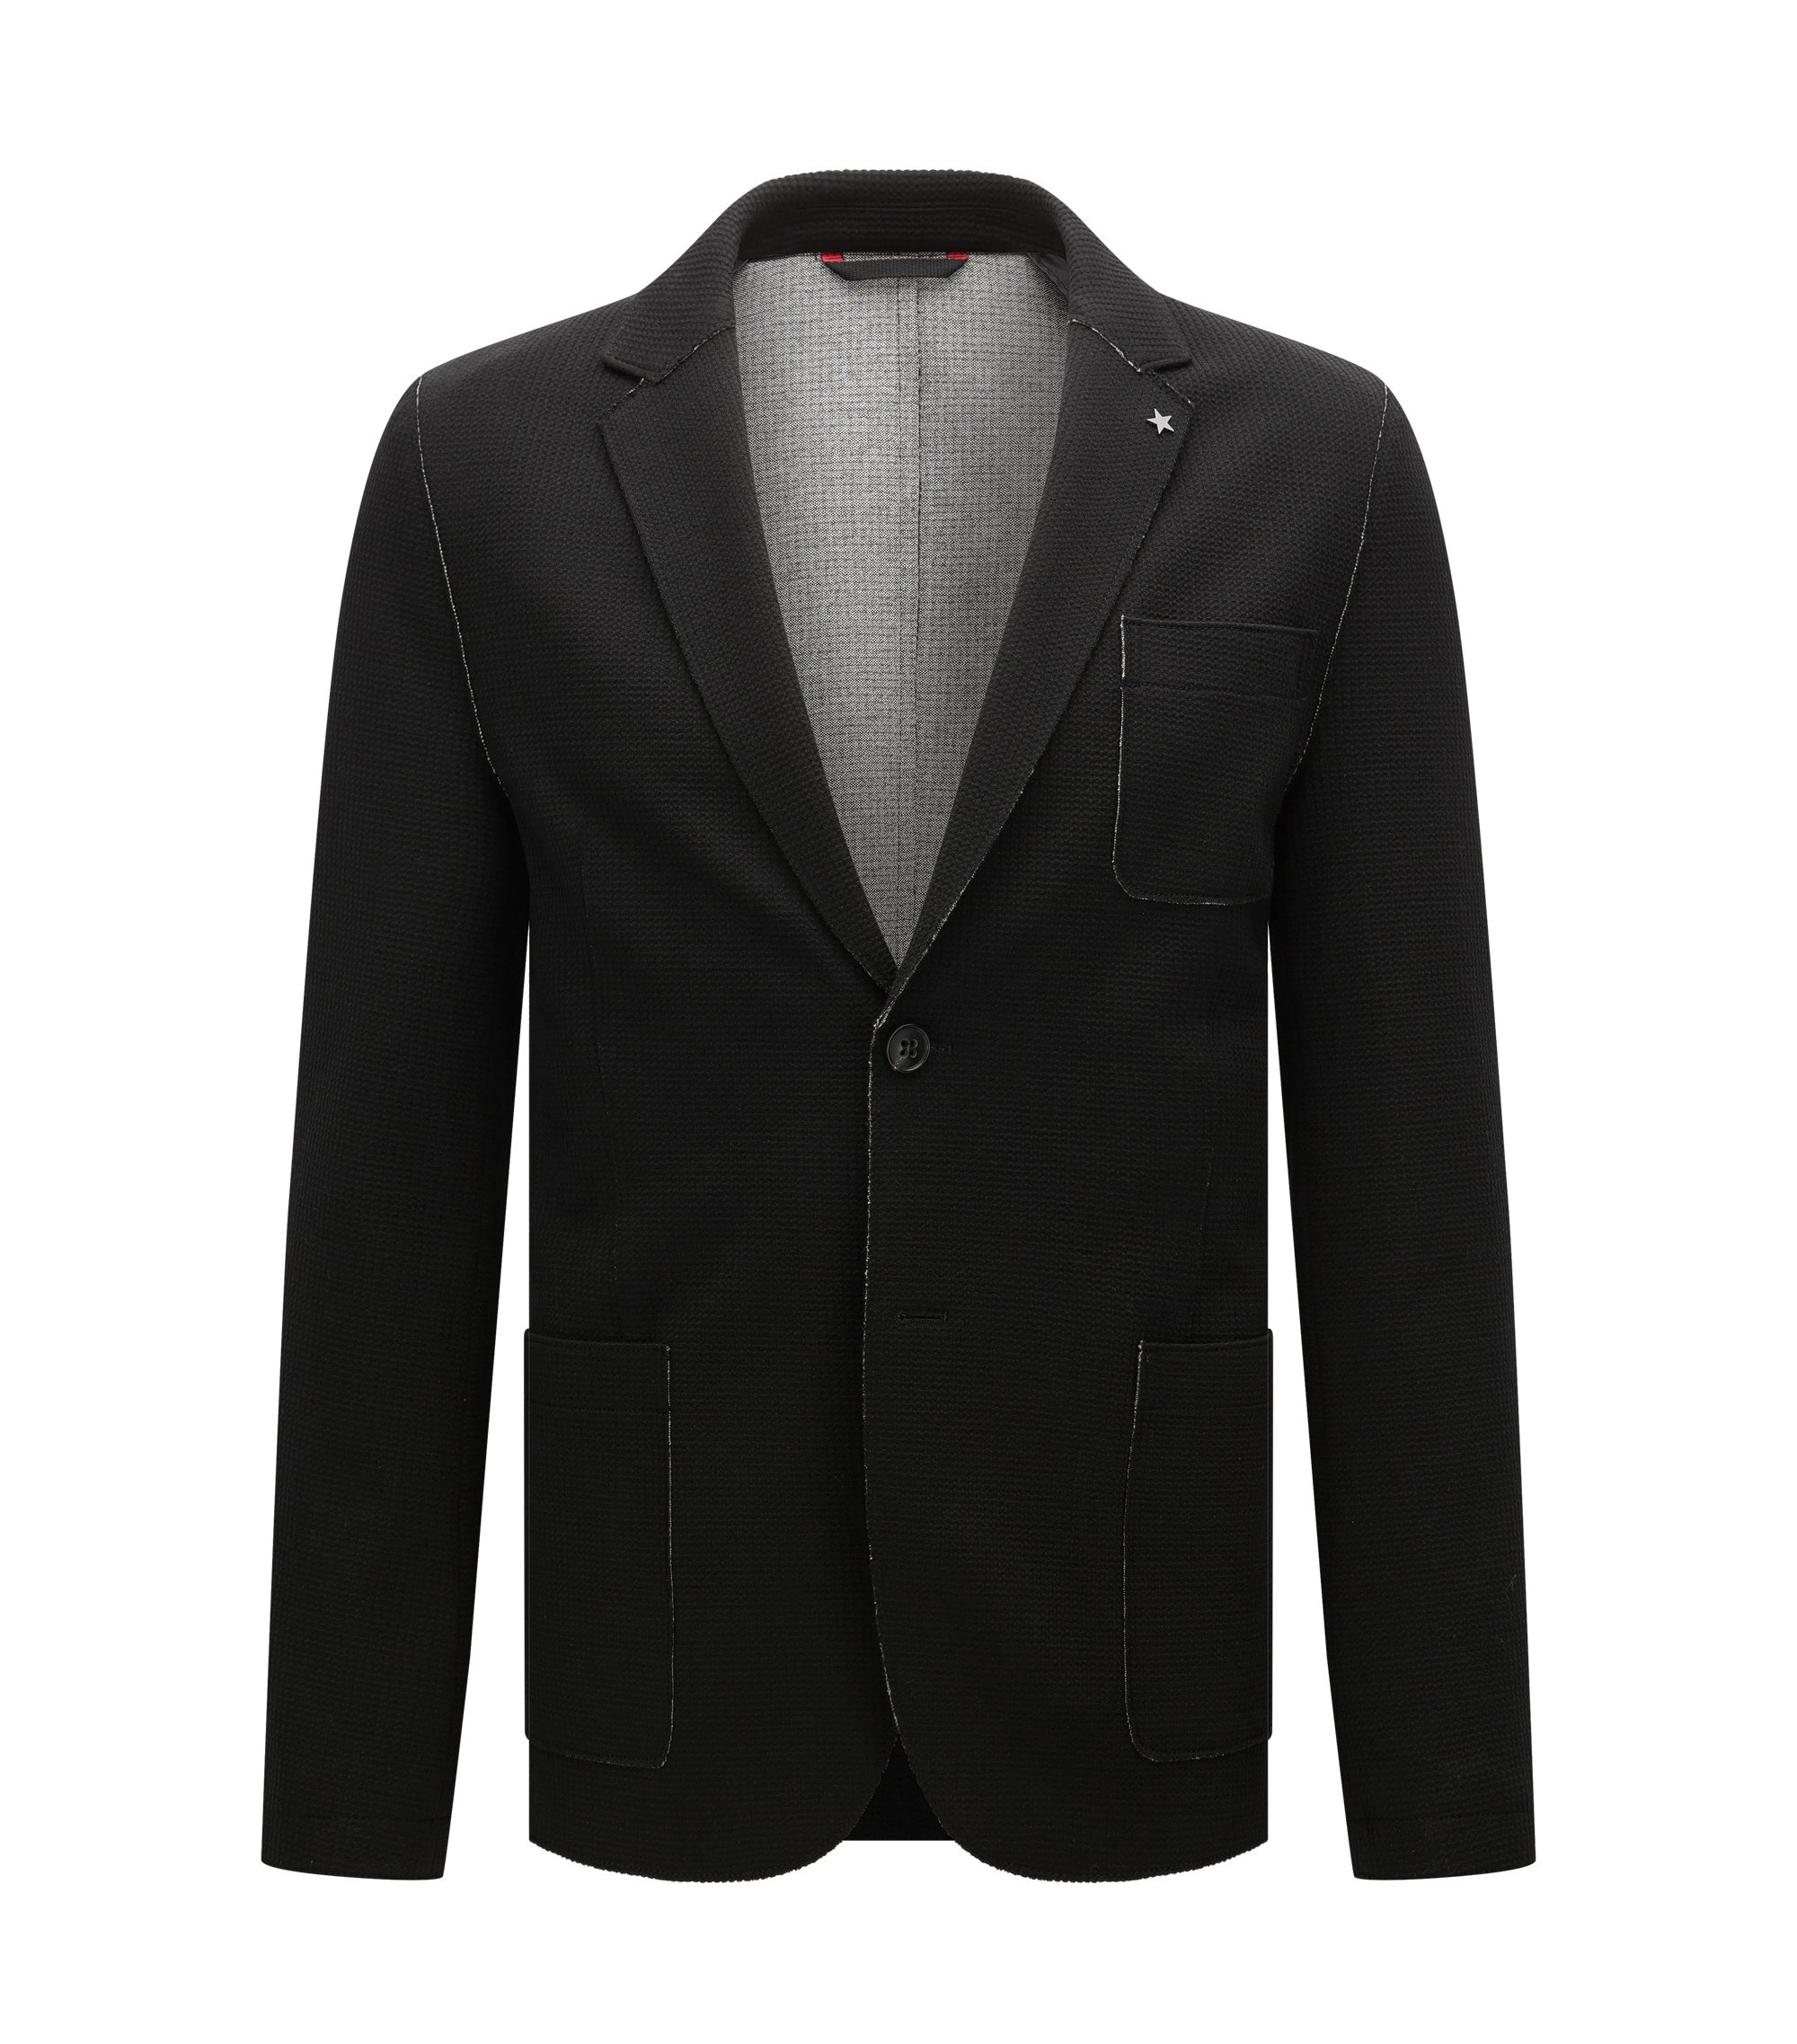 Waffle Knit Jersey Sport Coat, Slim Fit   Agalton, Black